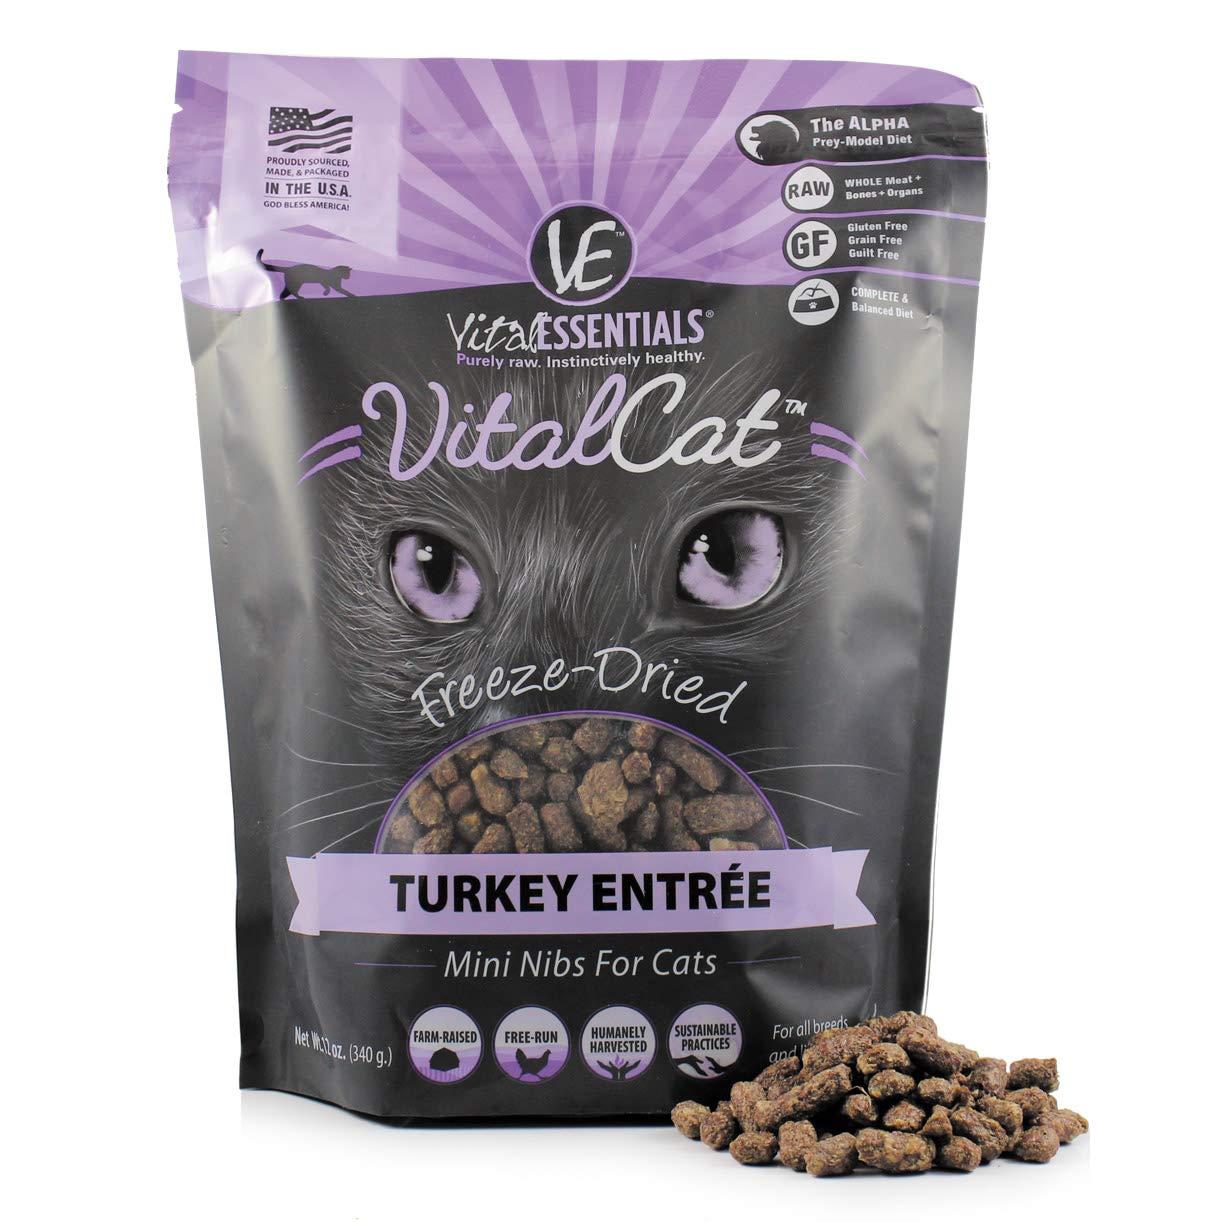 Vital Essentials Vital Cat Freeze-Dried Turkey Mini Nibs Grain Free Limited Ingredient Cat Entrée, 12 Ounce Bag by Vital Essentials